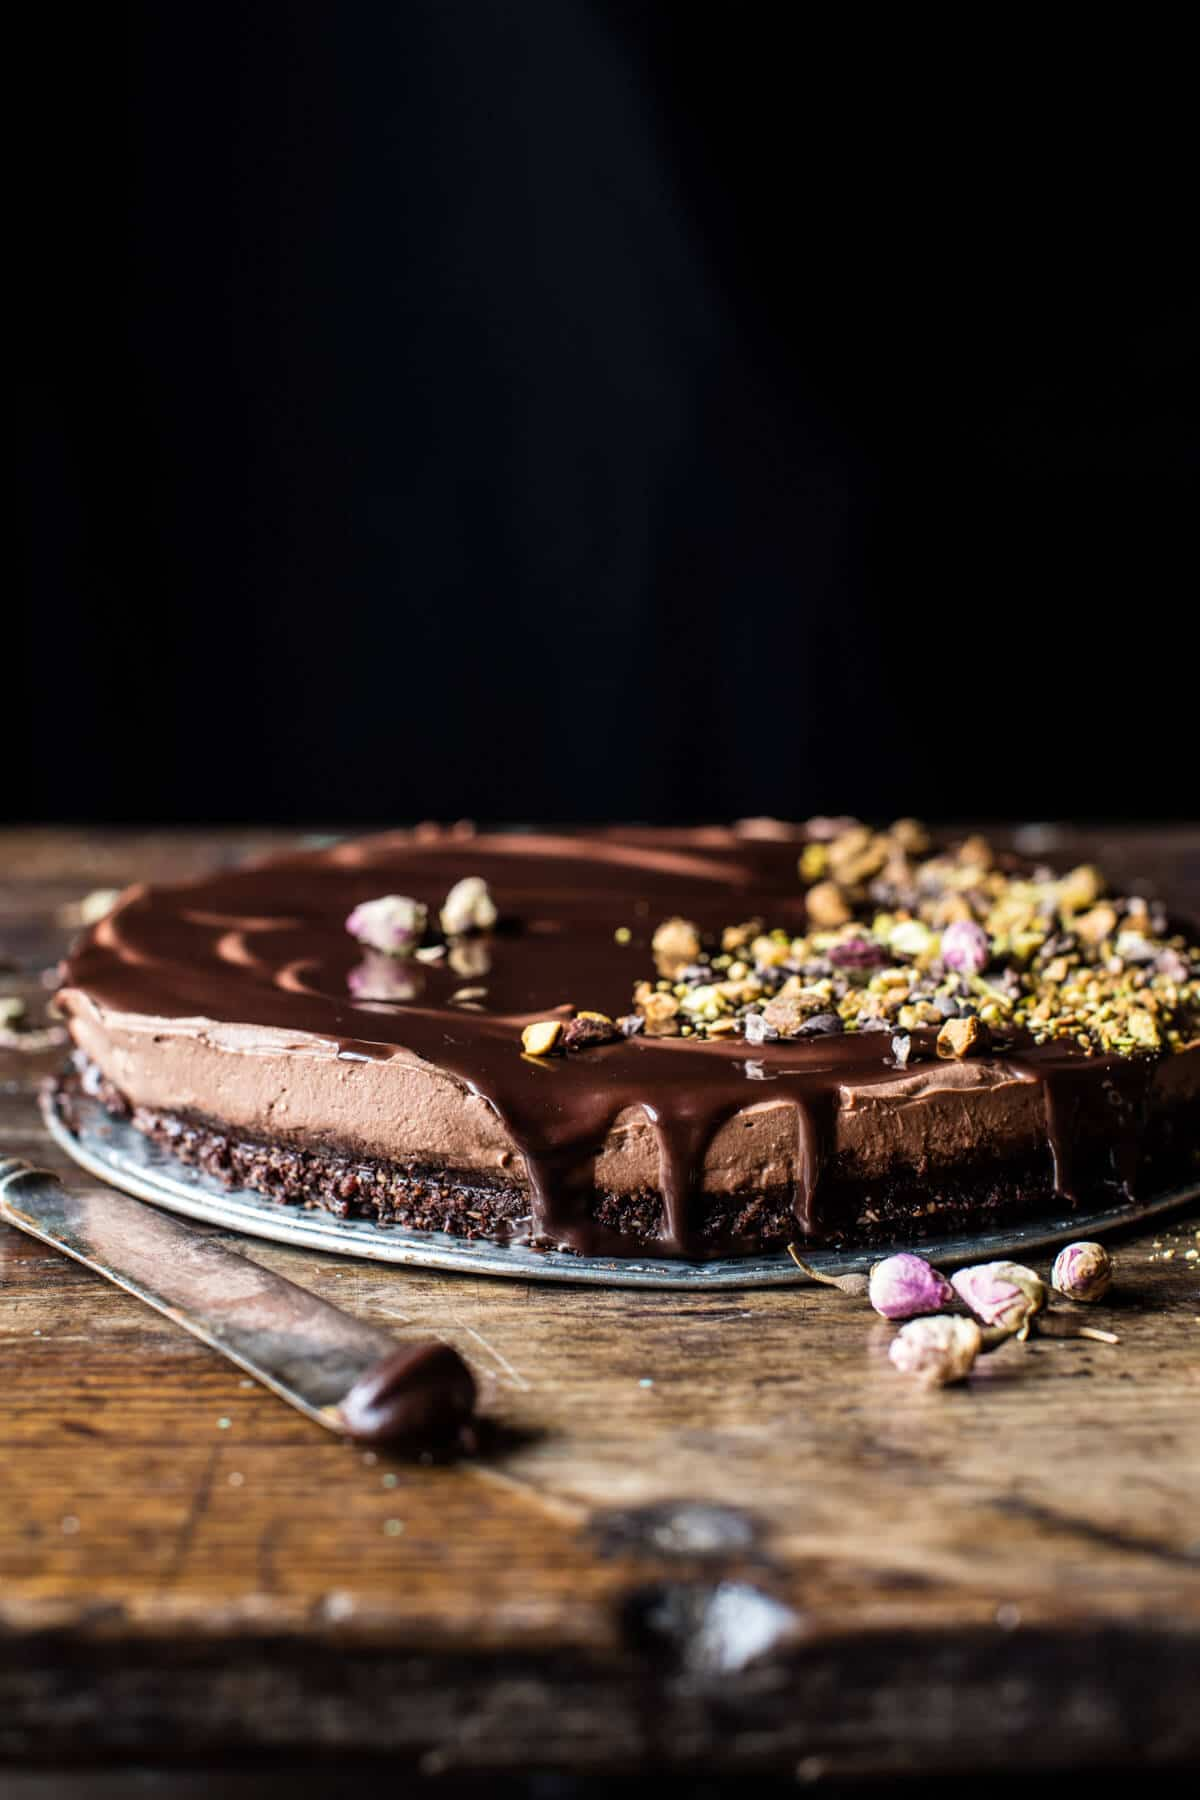 Chocolate-Lovers-Greek-Yogurt-Chocolate-Mousse-Cake-5.jpg